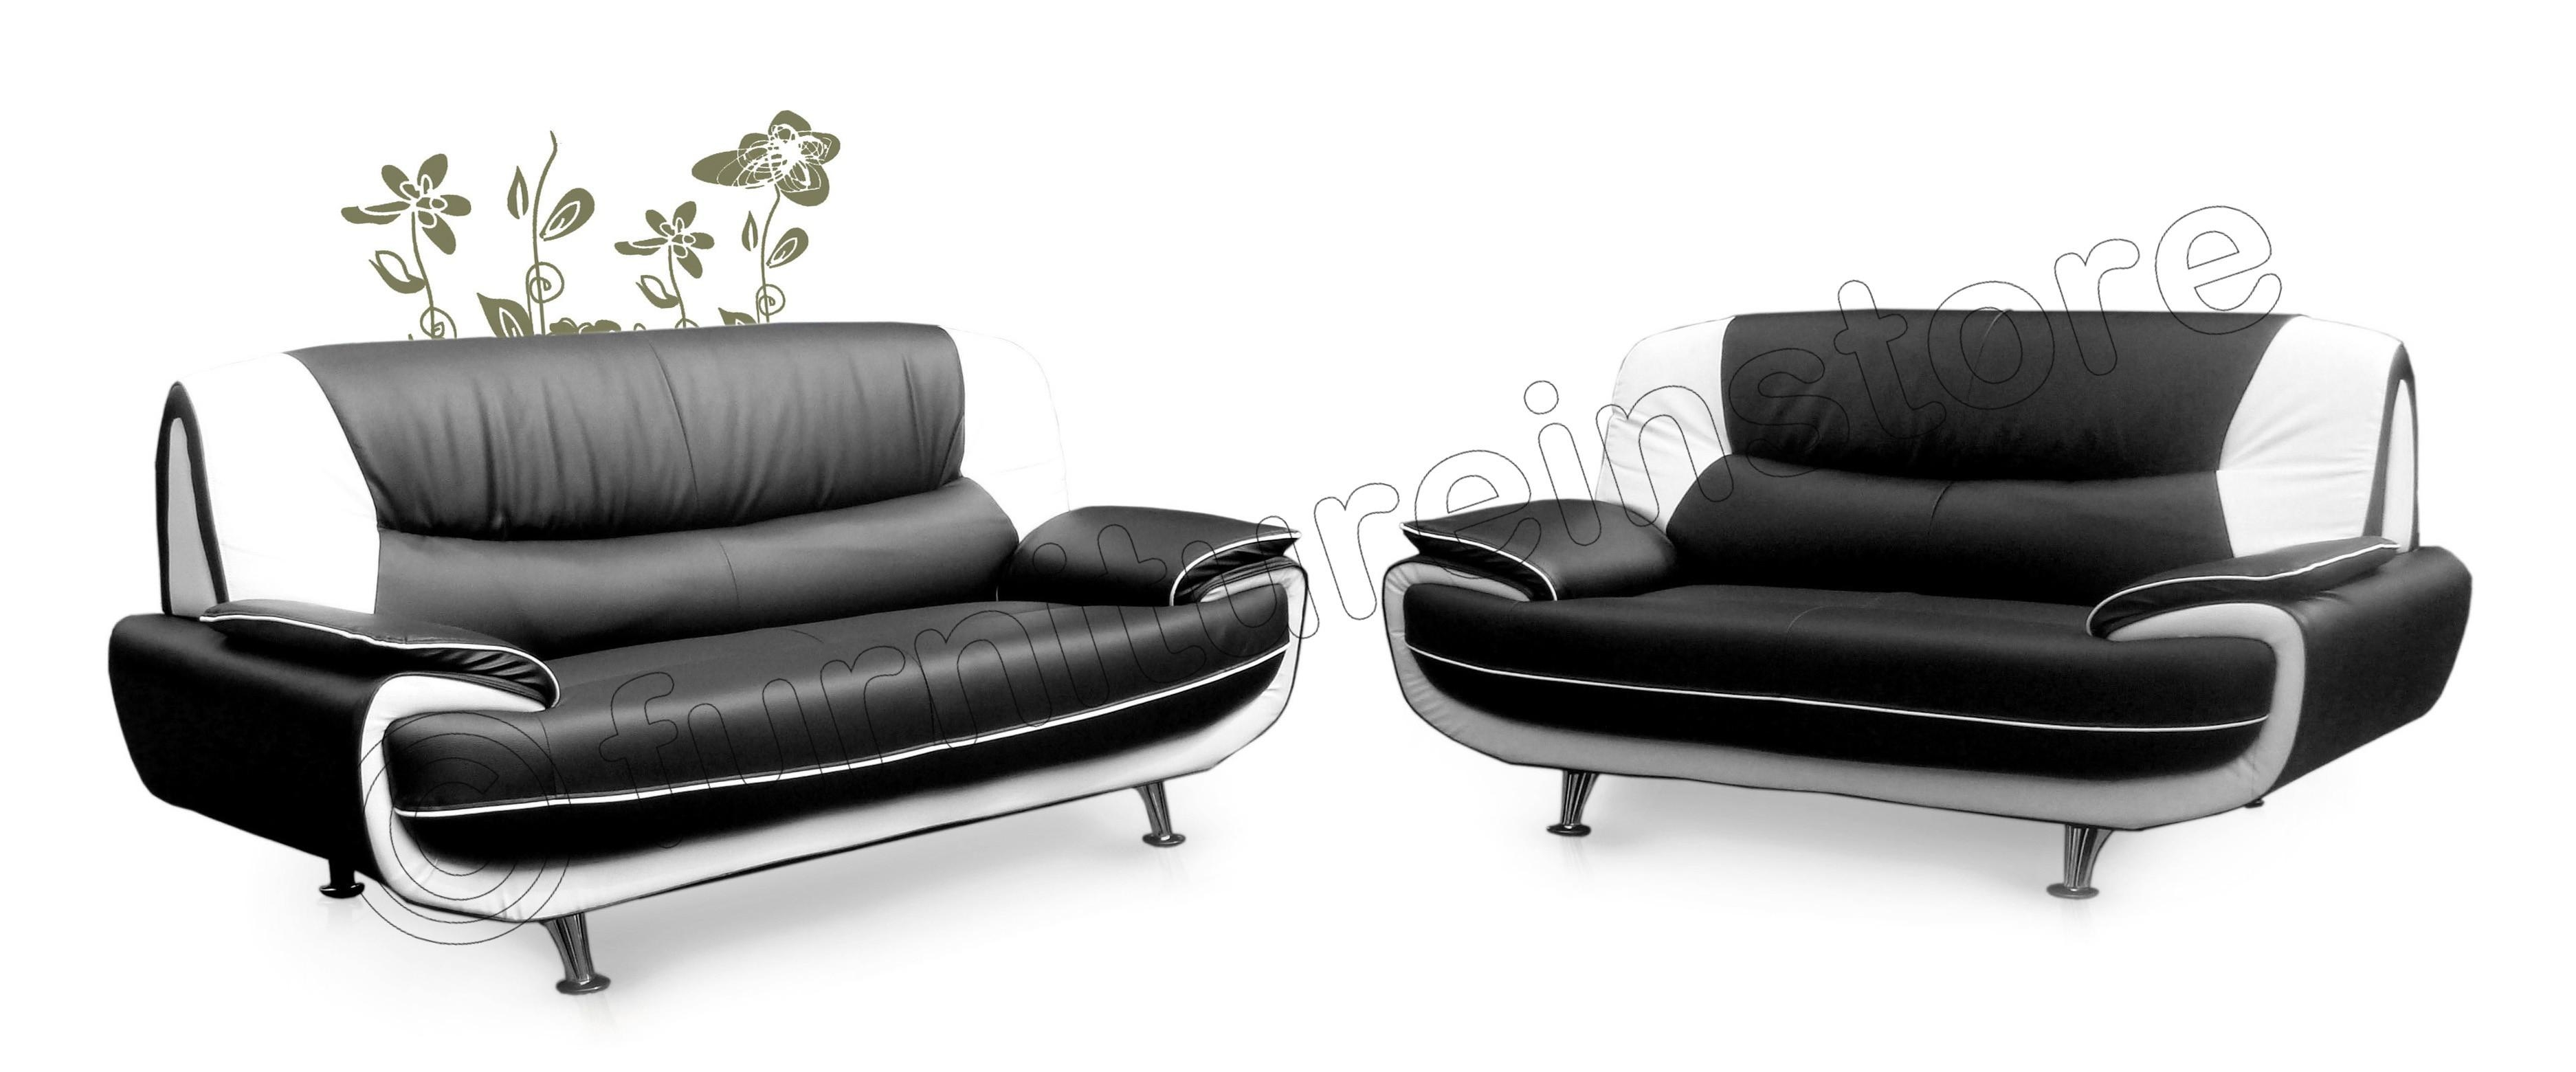 Black And White Sofa With Ideas Photo 2881 | Imonics With Regard To White And Black Sofas (Image 13 of 21)